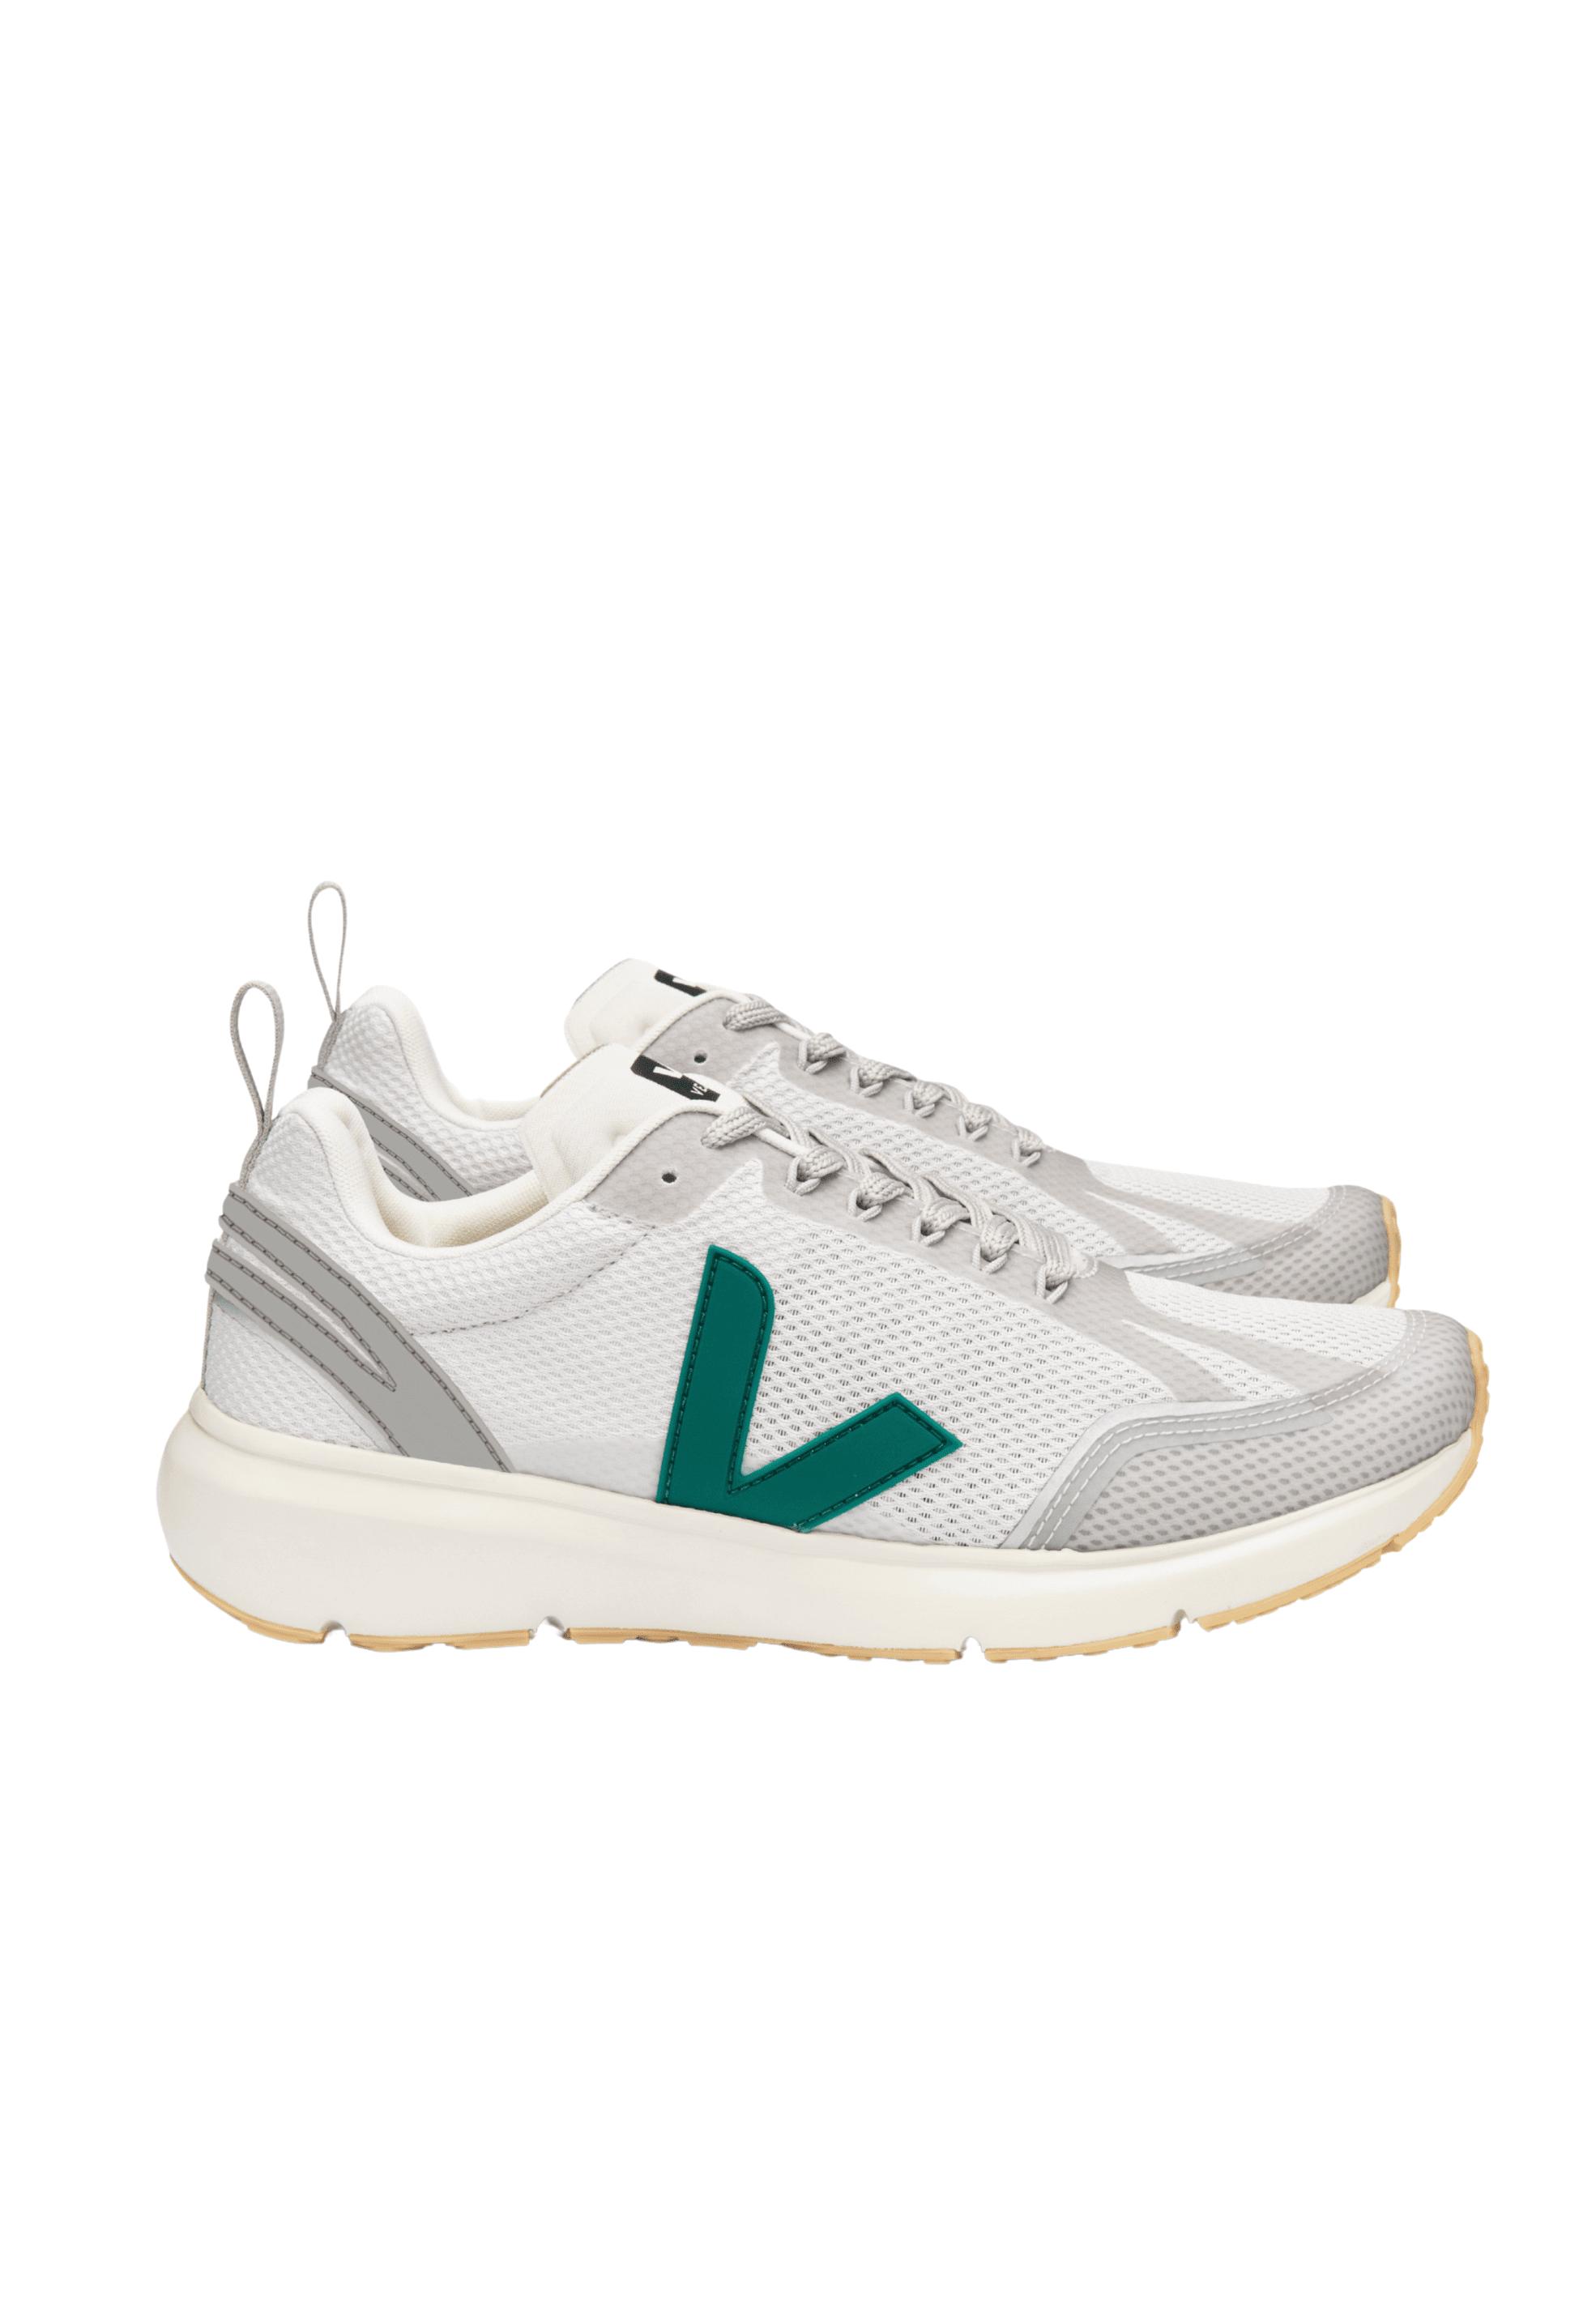 Condor 2 Alveomesh Women Running Shoe Light Grey Brittany